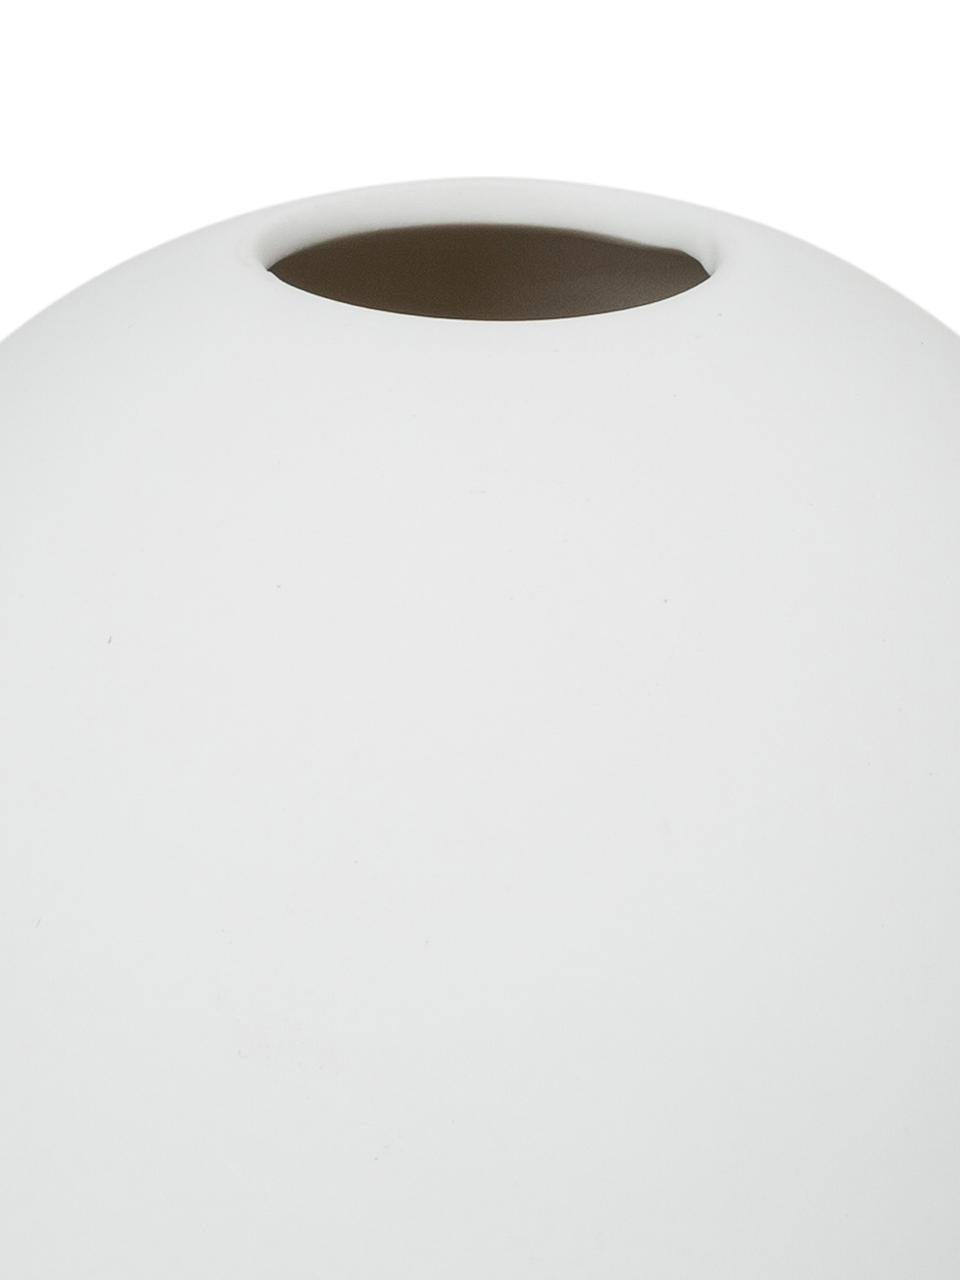 Handgefertigte Kugel-Vase Ball, Keramik, Weiß, Ø 10 x H 10 cm